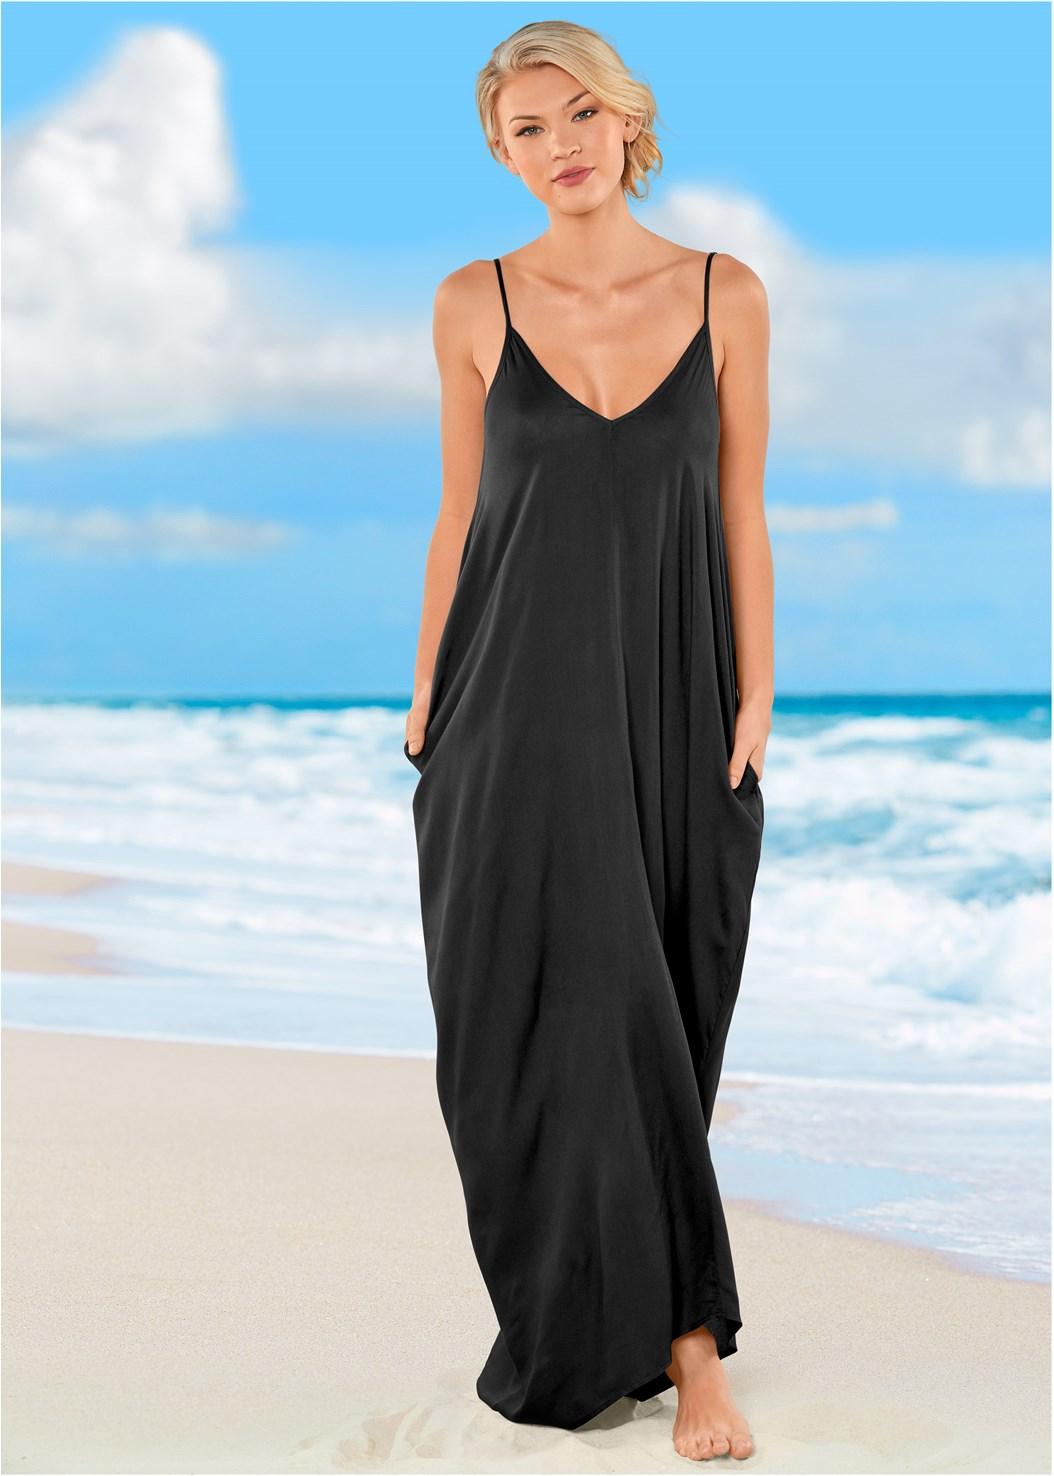 Boho Maxi Dress Cover-Up,Lovely Lift Wrap Bikini Top,Lattice Side Bikini Bottom,Strappy Back One-Piece,Strappy Toe Ring Sandals